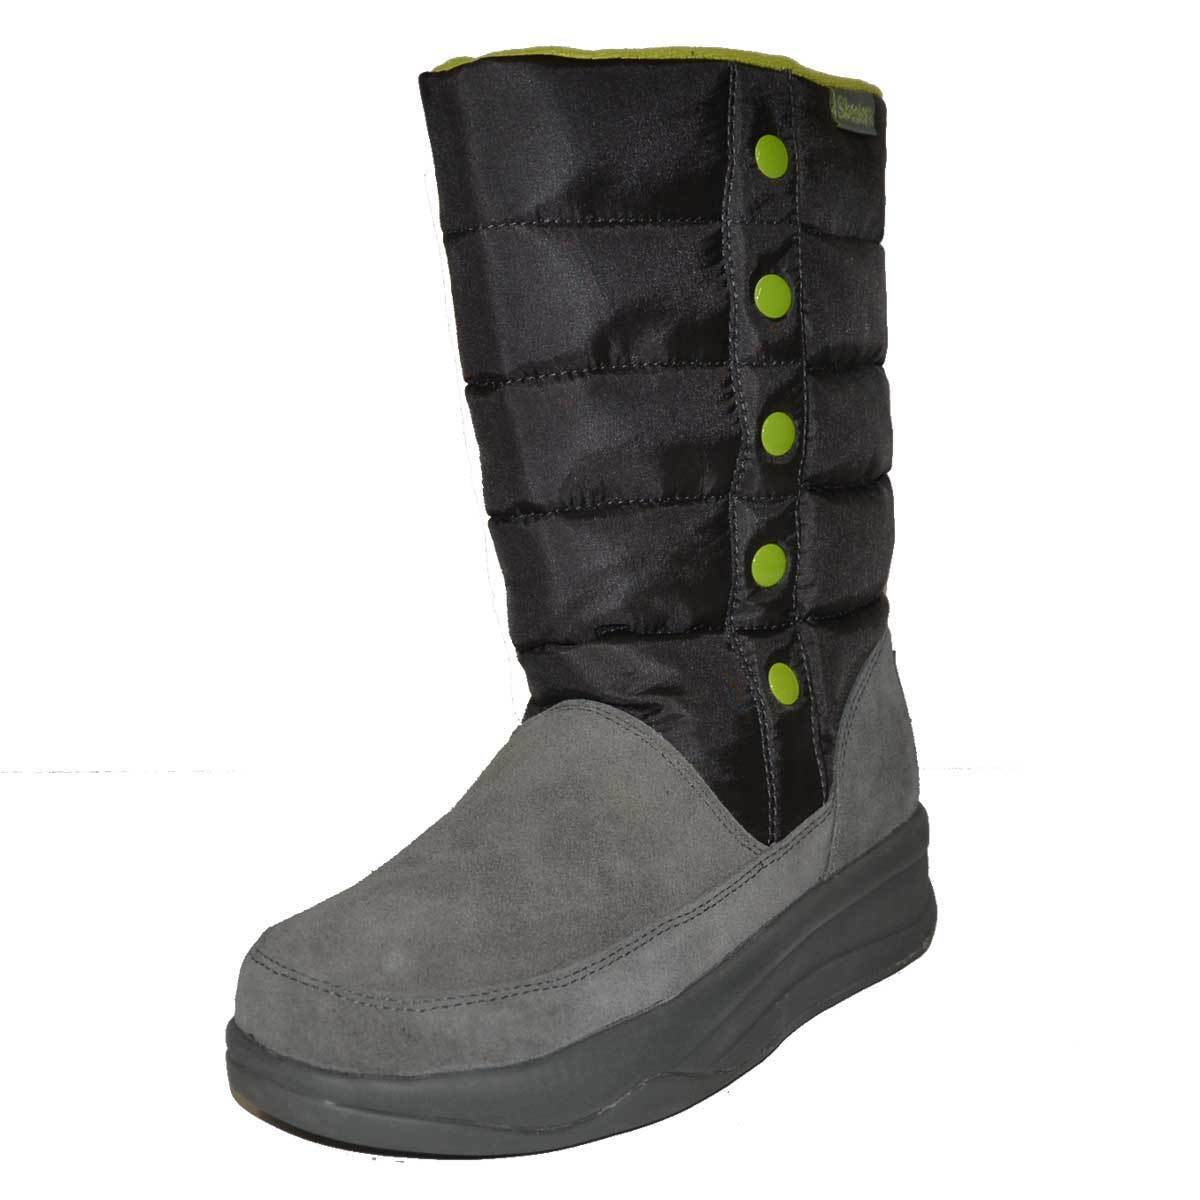 Skechers Australia Womens Shoes Grey Boots